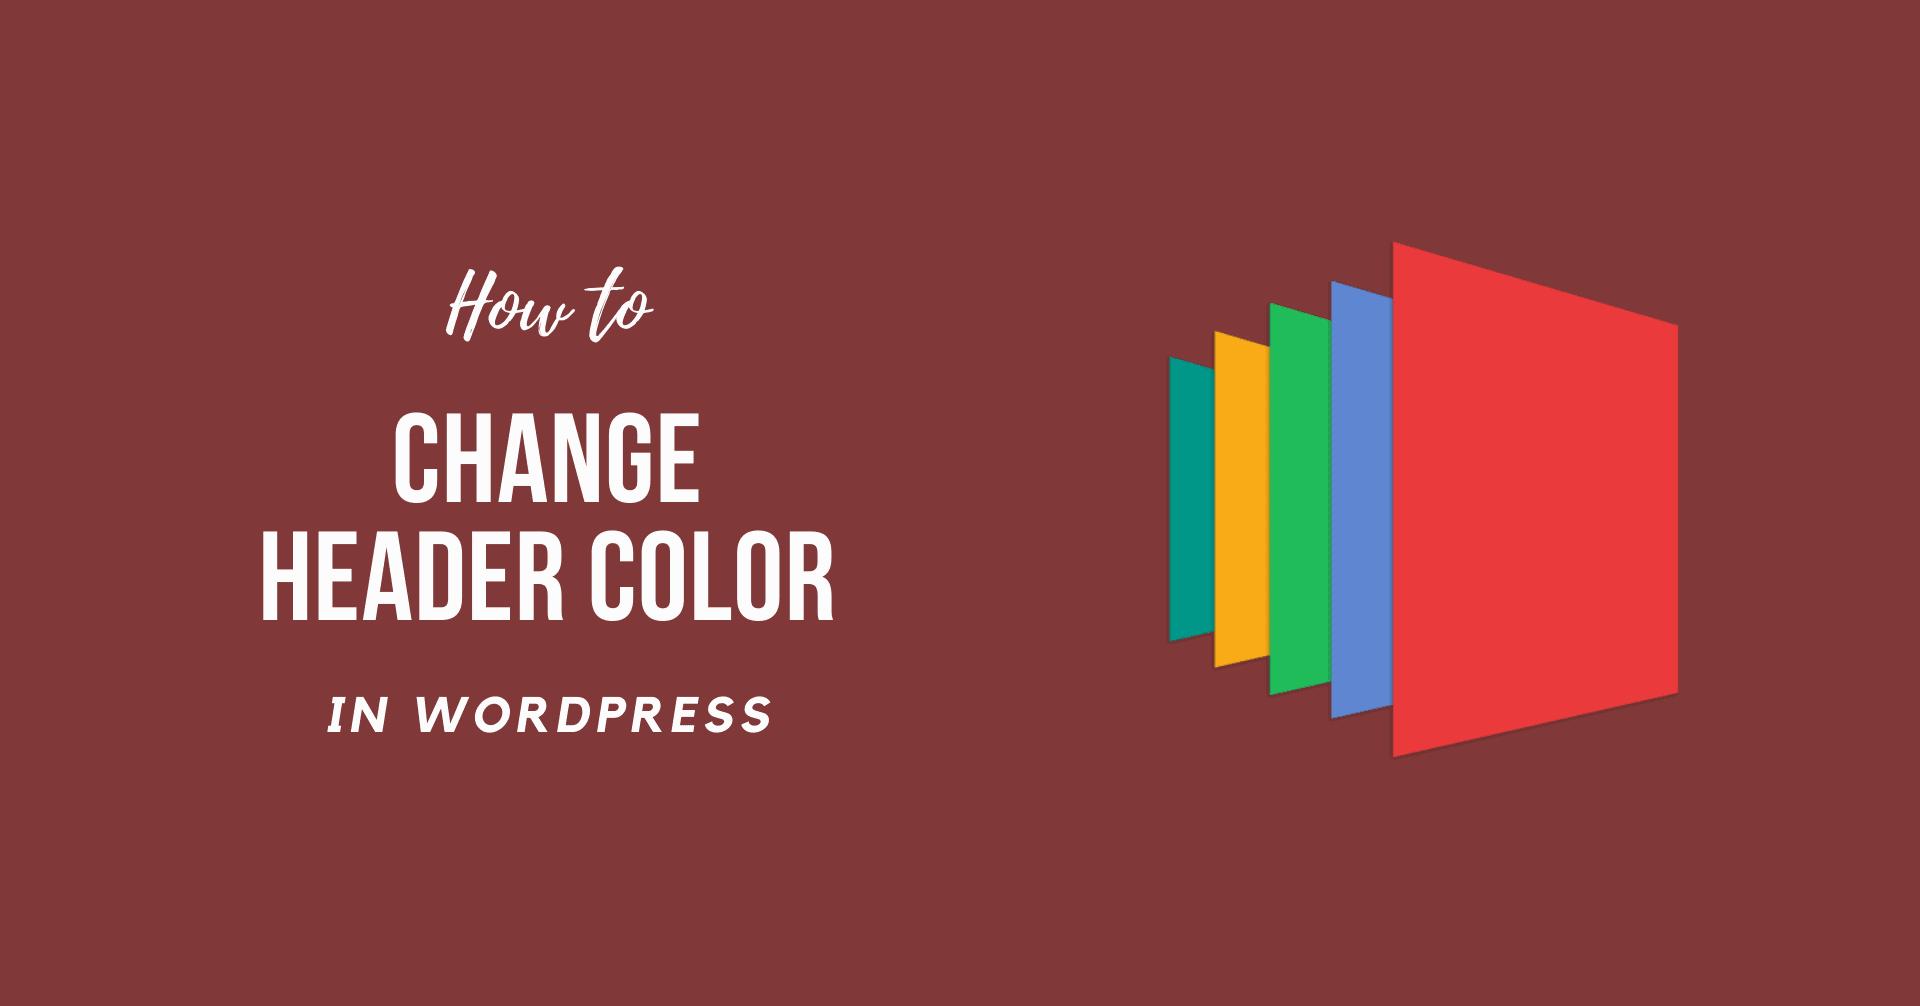 How to Change Header Color in WordPress